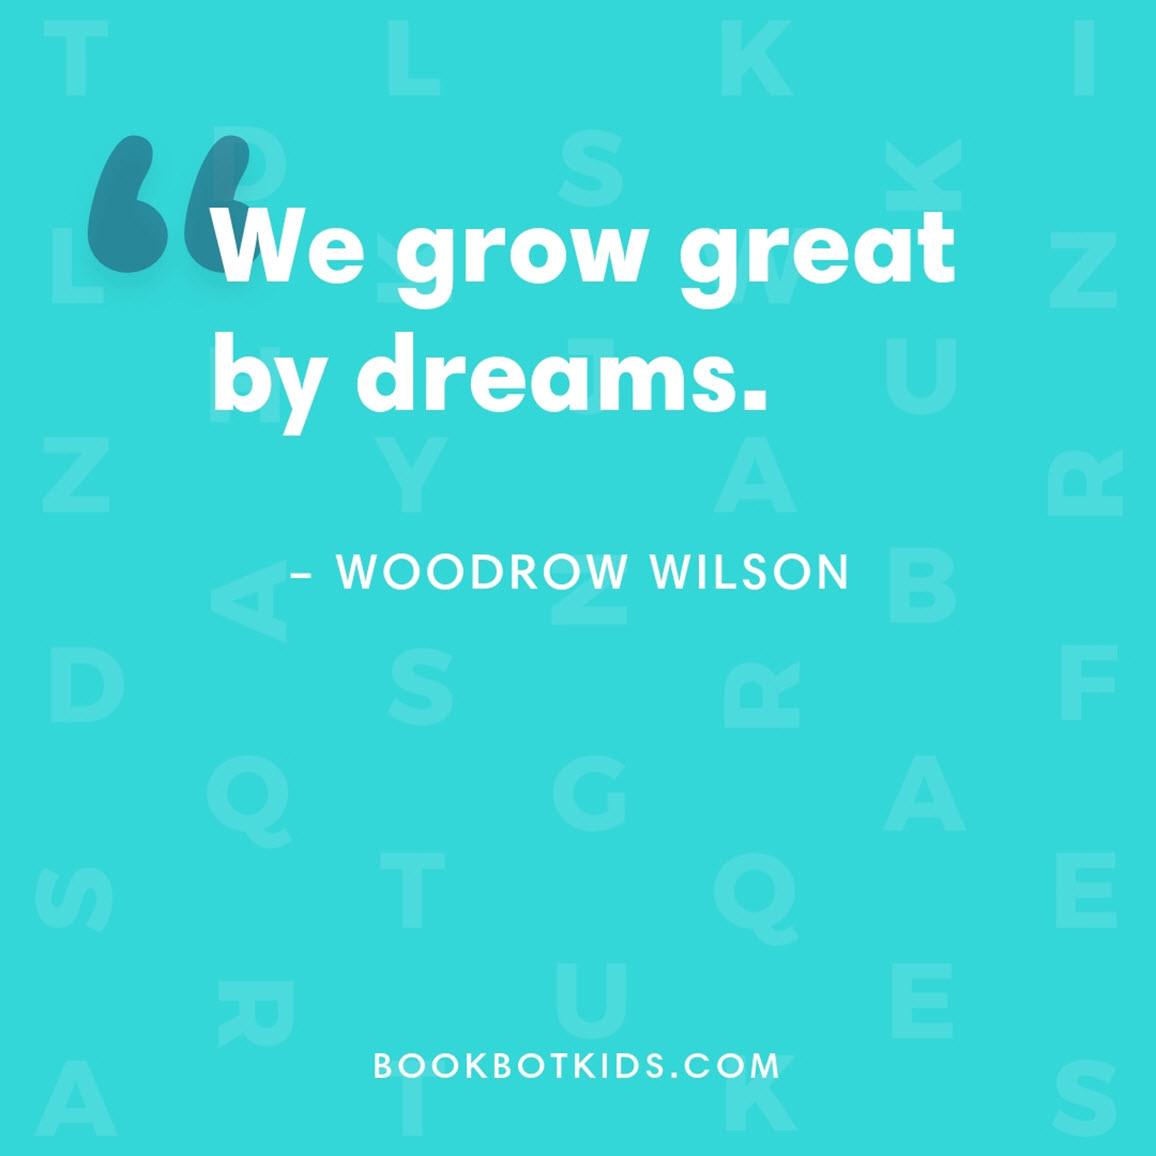 We grow great by dreams. – Woodrow Wilson